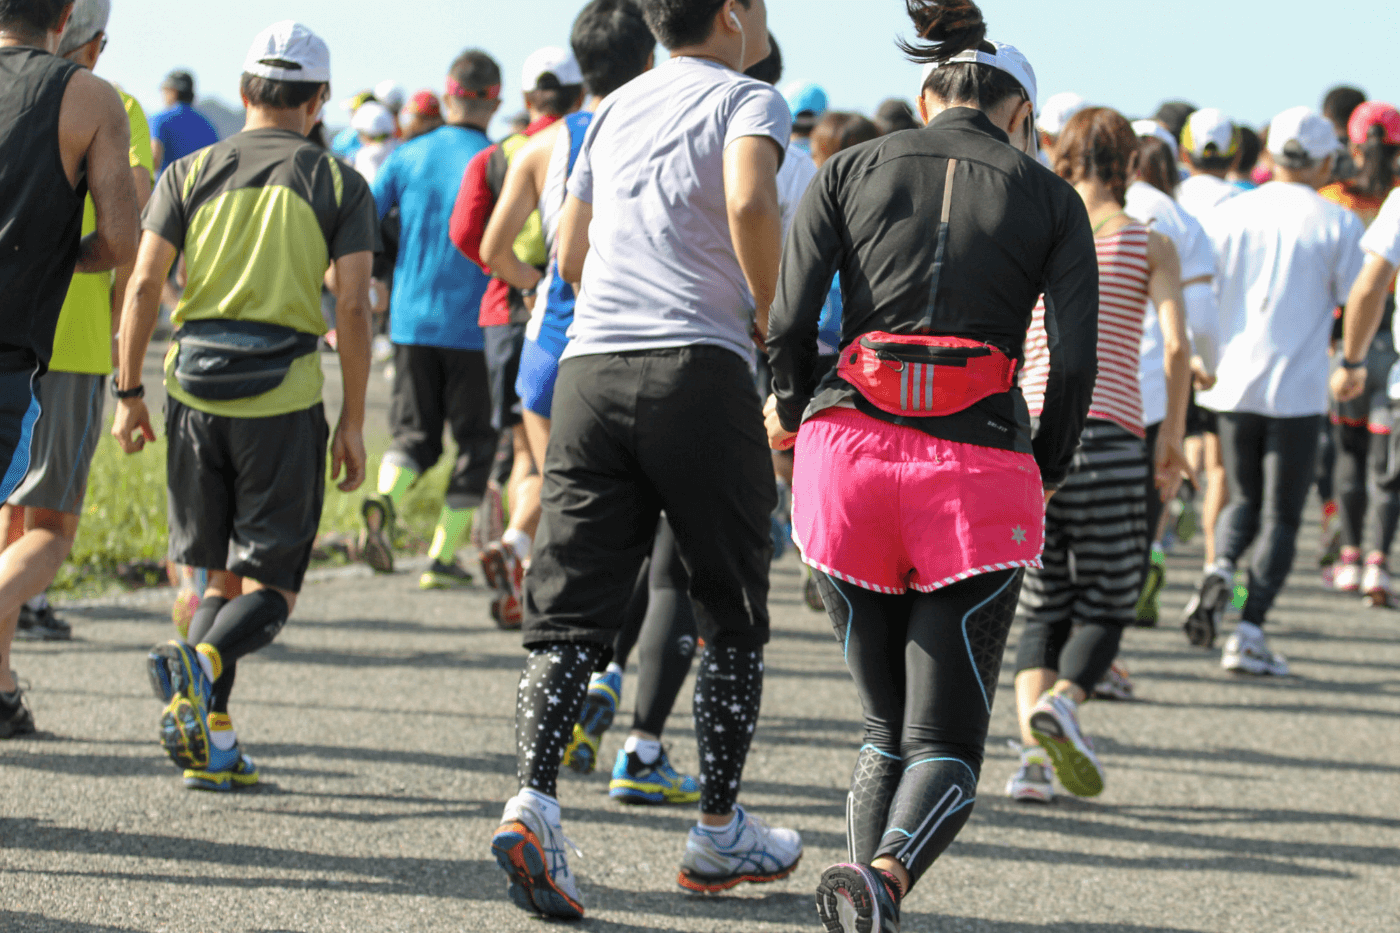 大山町名和マラソンフェスタ2020 | 鳥取(大山町名和総合運動公園・陸上競技場)